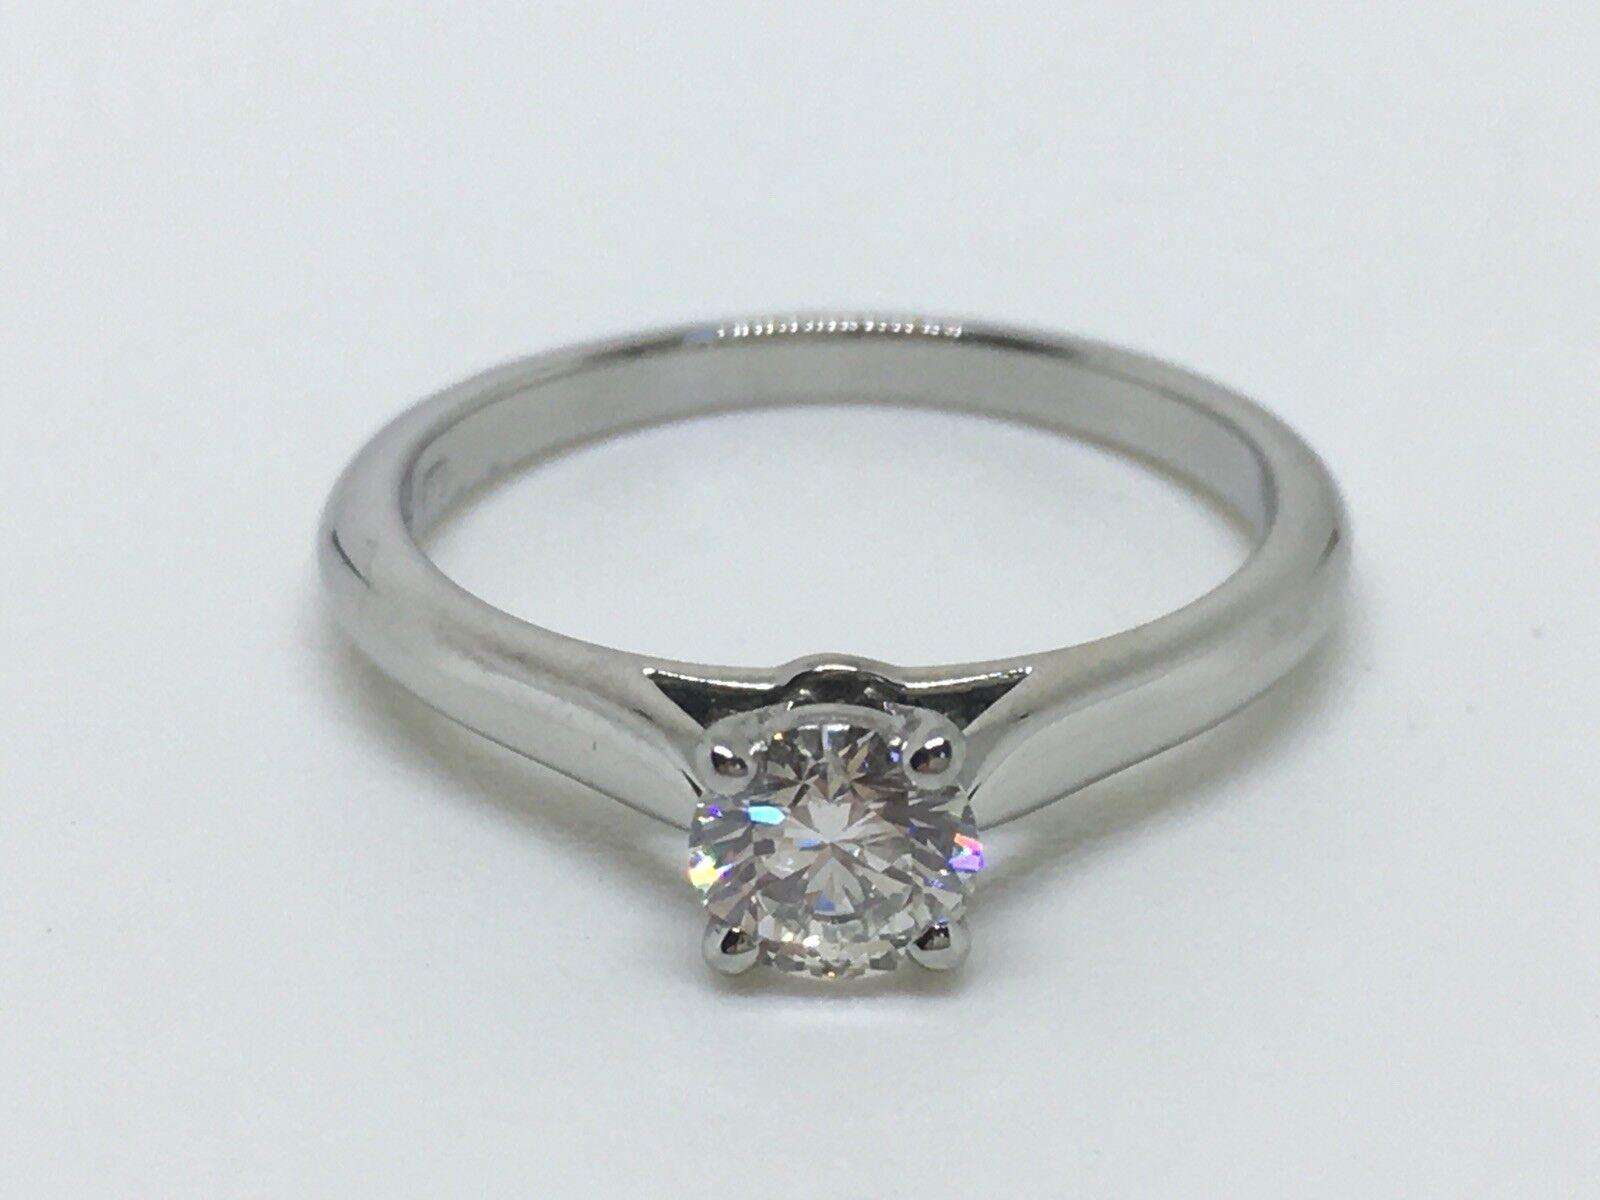 Cartier Diamond Platinum Round Solitaire Ring 0.31 ctw GIA Certificate Box